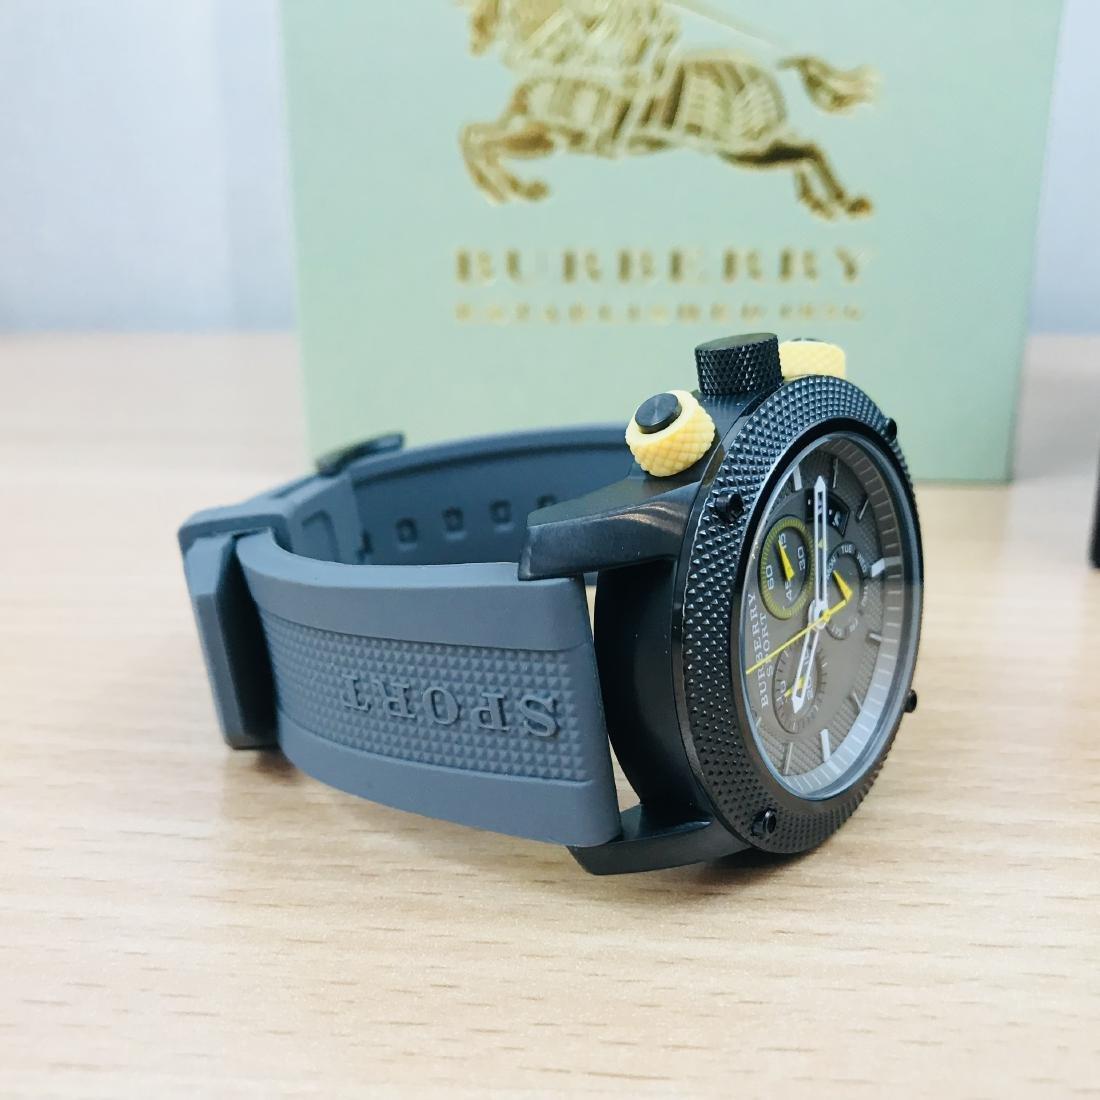 Burberry Endurance Swiss Made Men's Chronograph Watch - 8